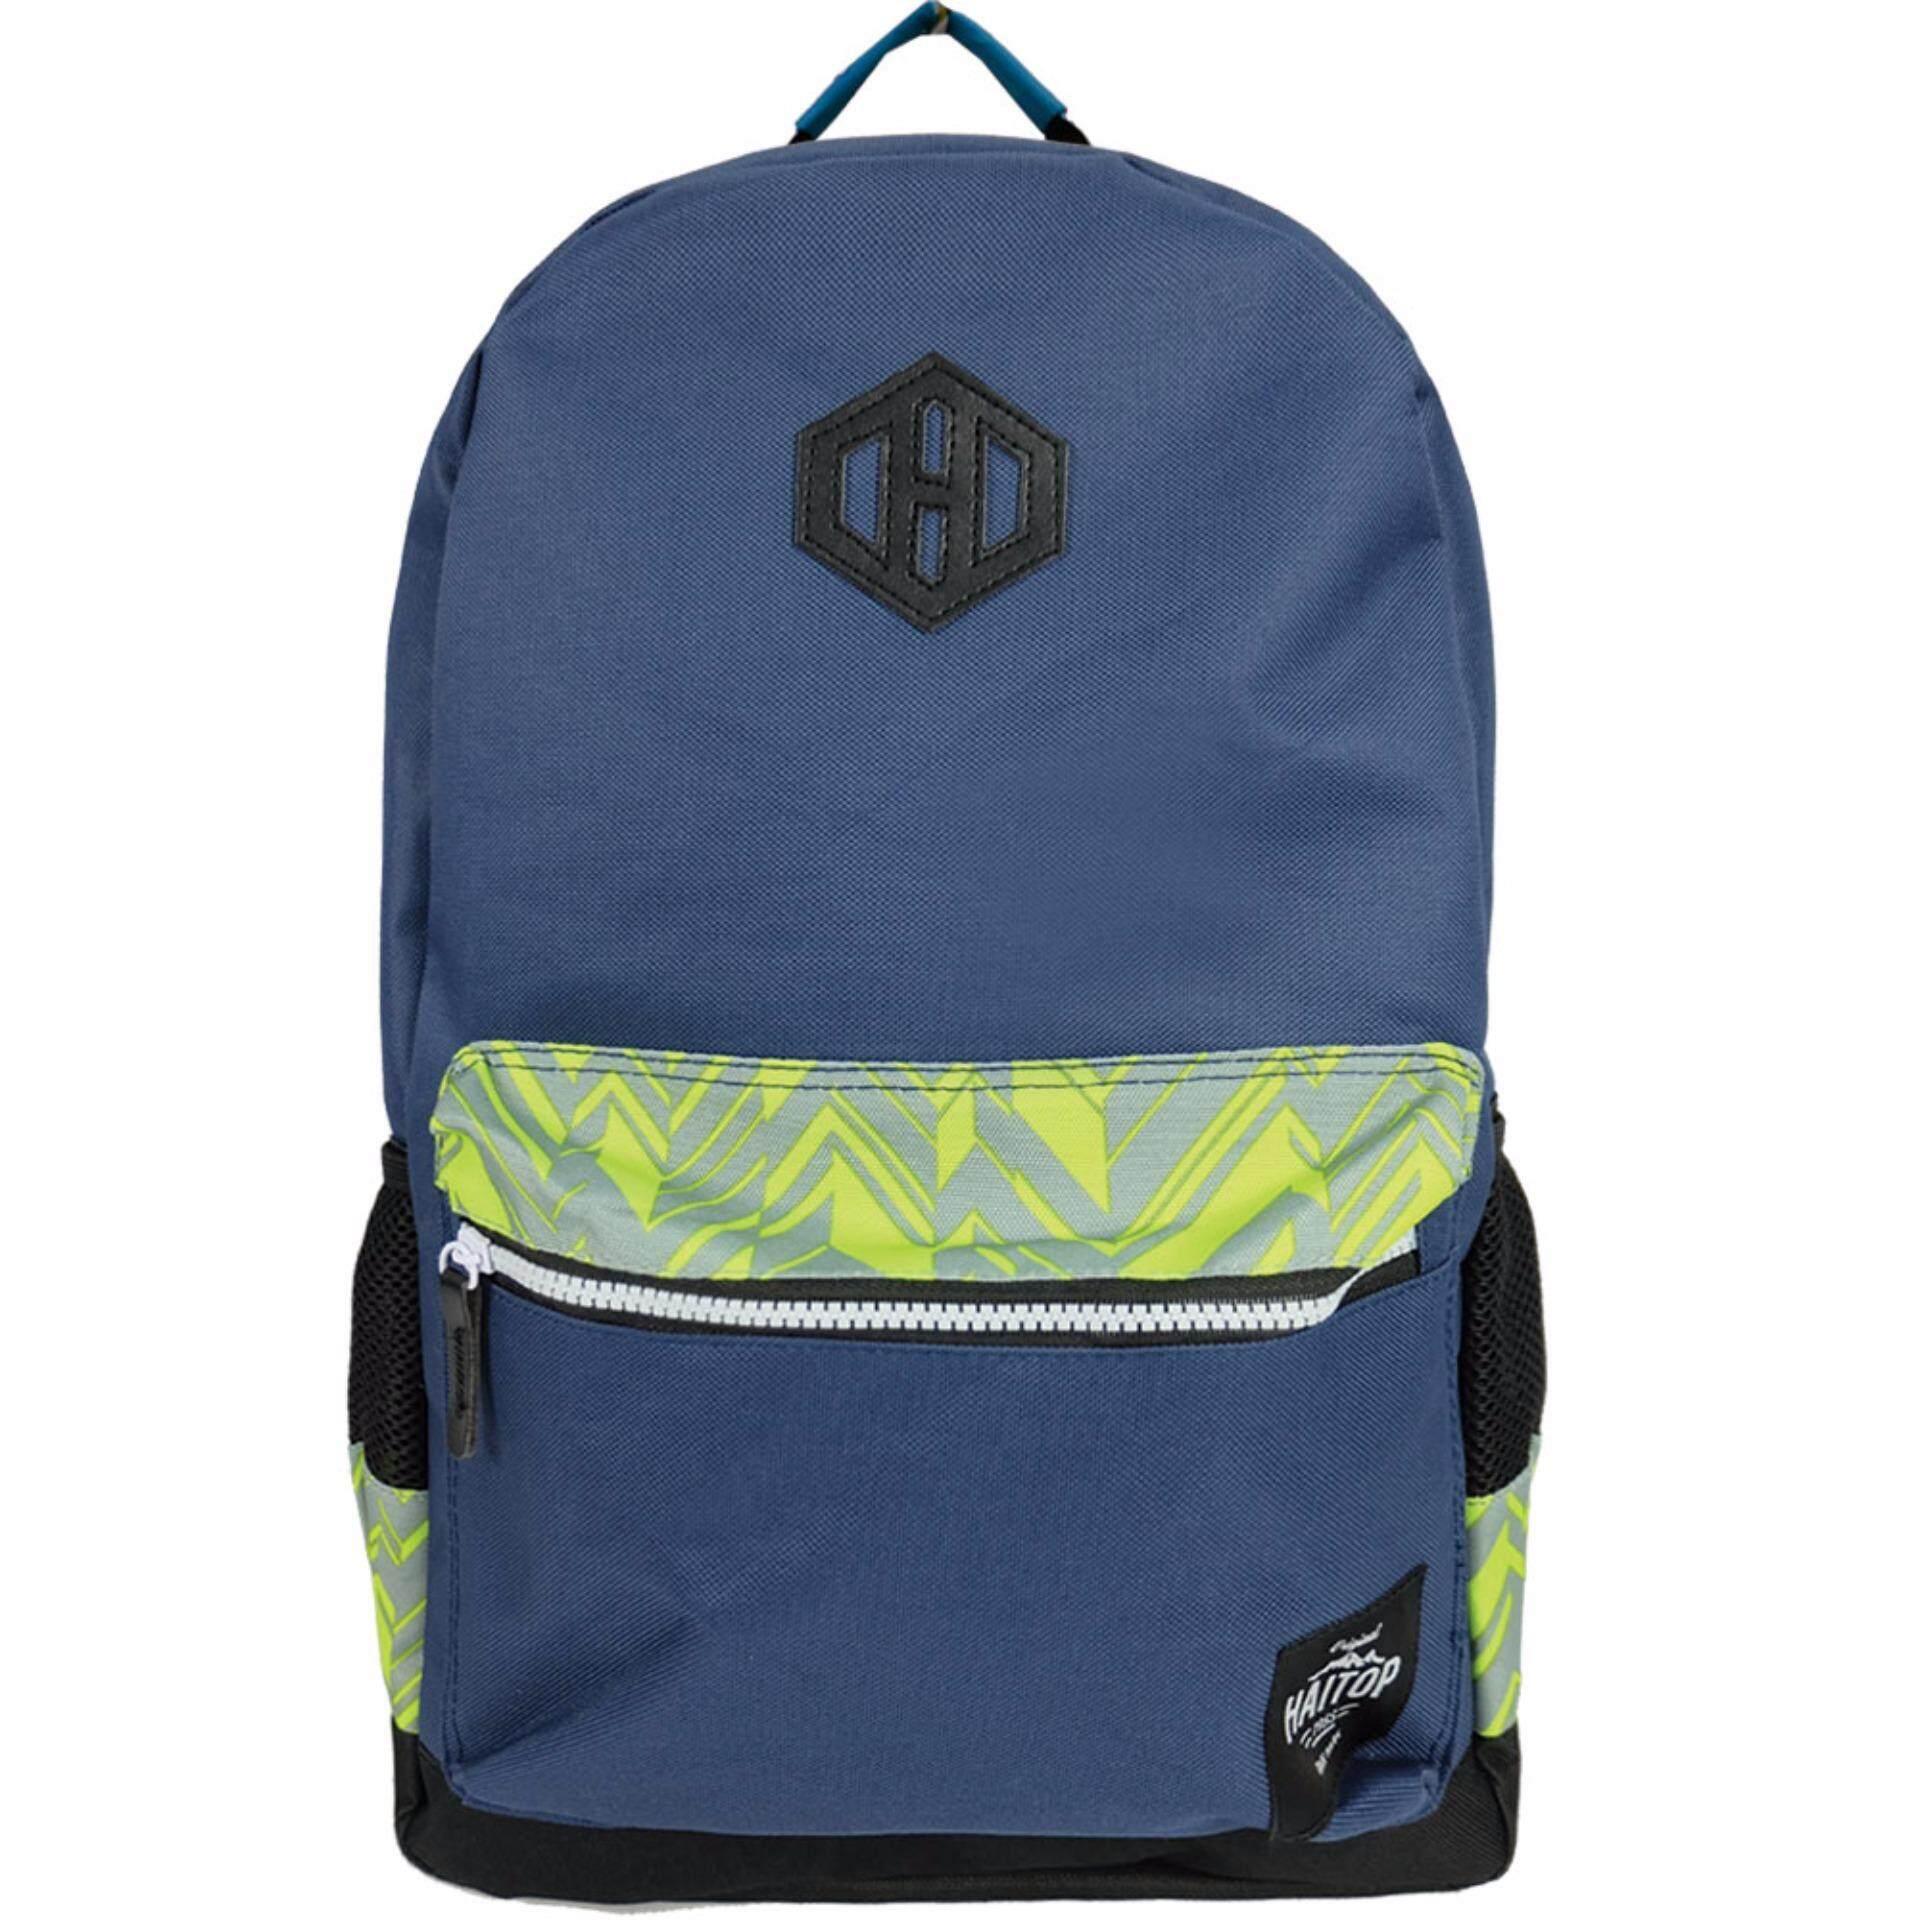 Haitop HB1653 18'' Trendy Backpack (Navy/Yellow)